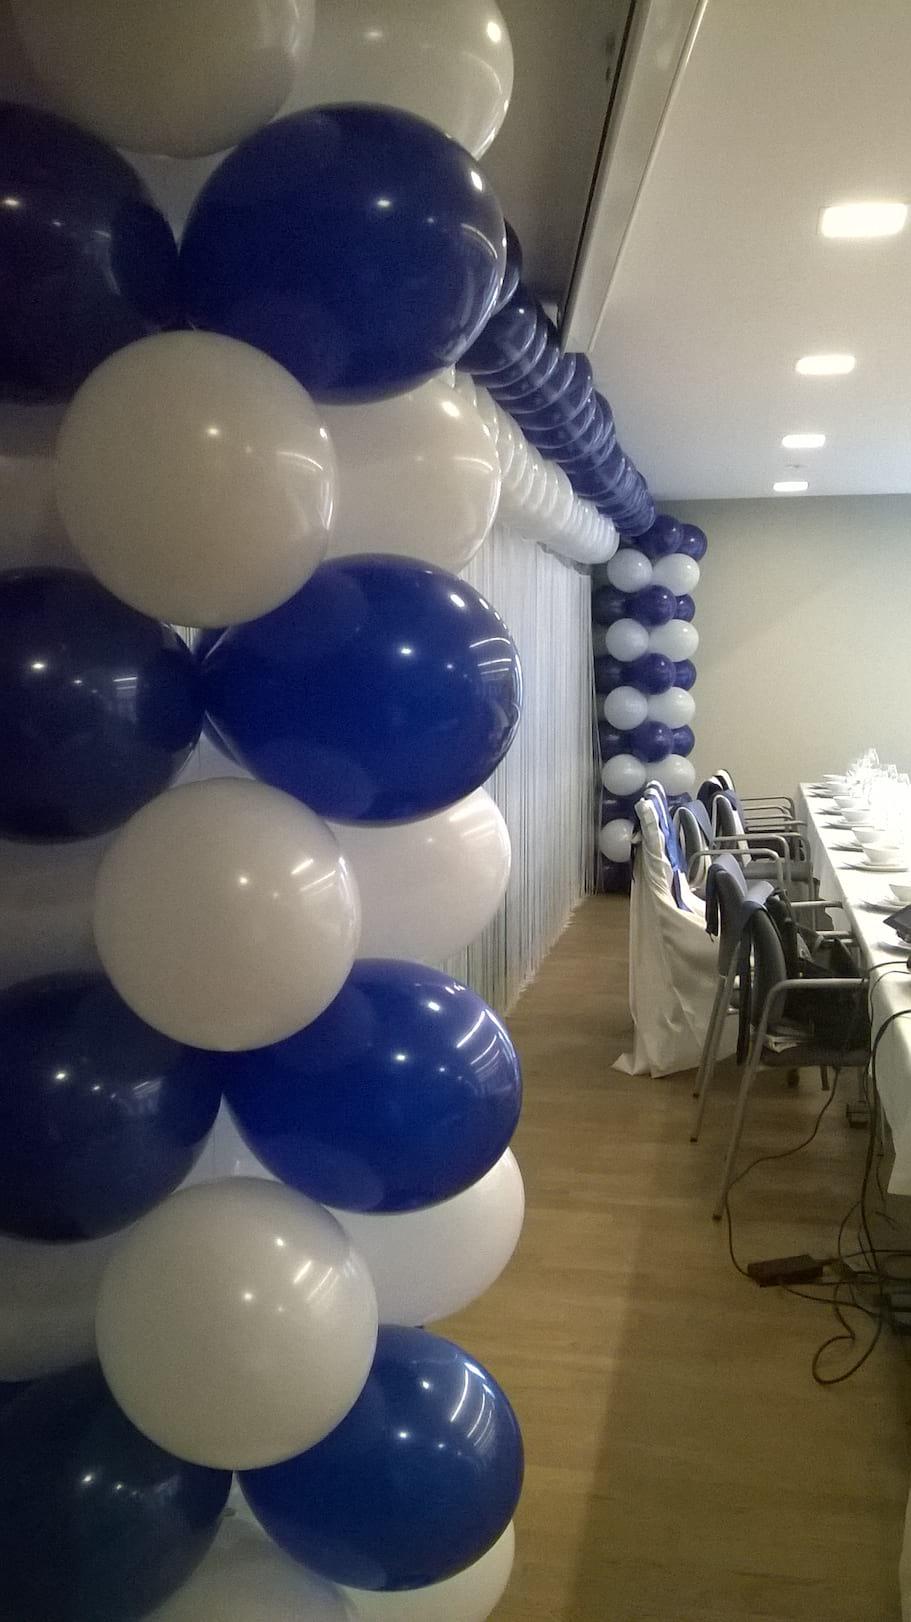 dekoracja balonowa